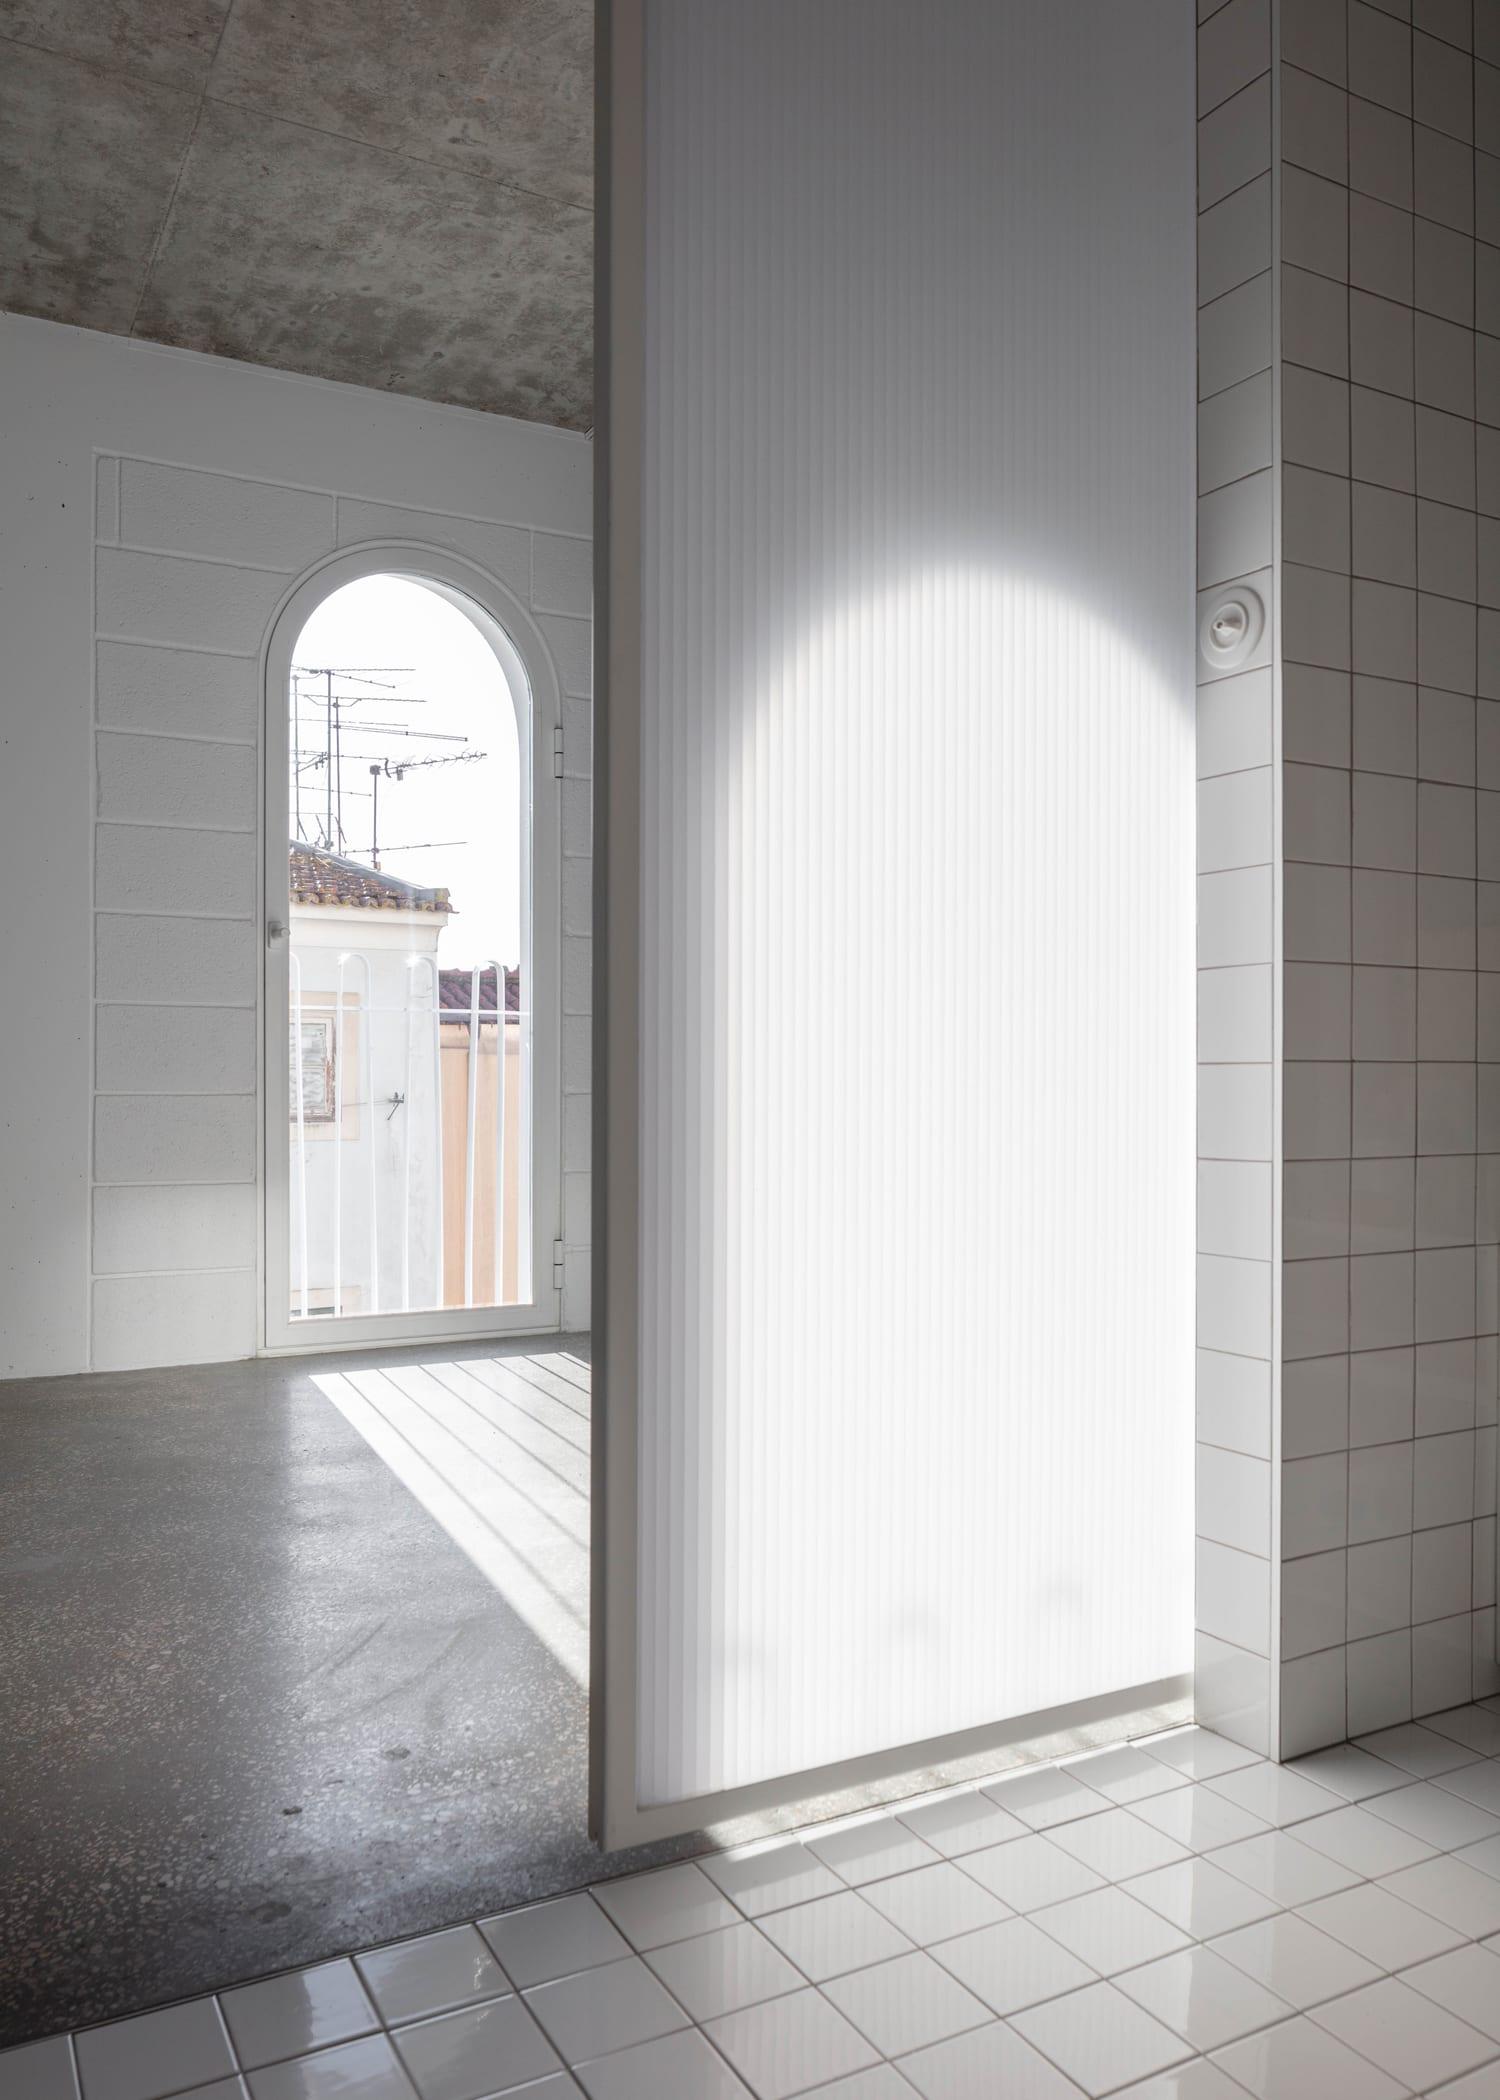 Dodged House In Lisbon By Leopold Banchini Daniel Zamarbide Yellowtrace 13